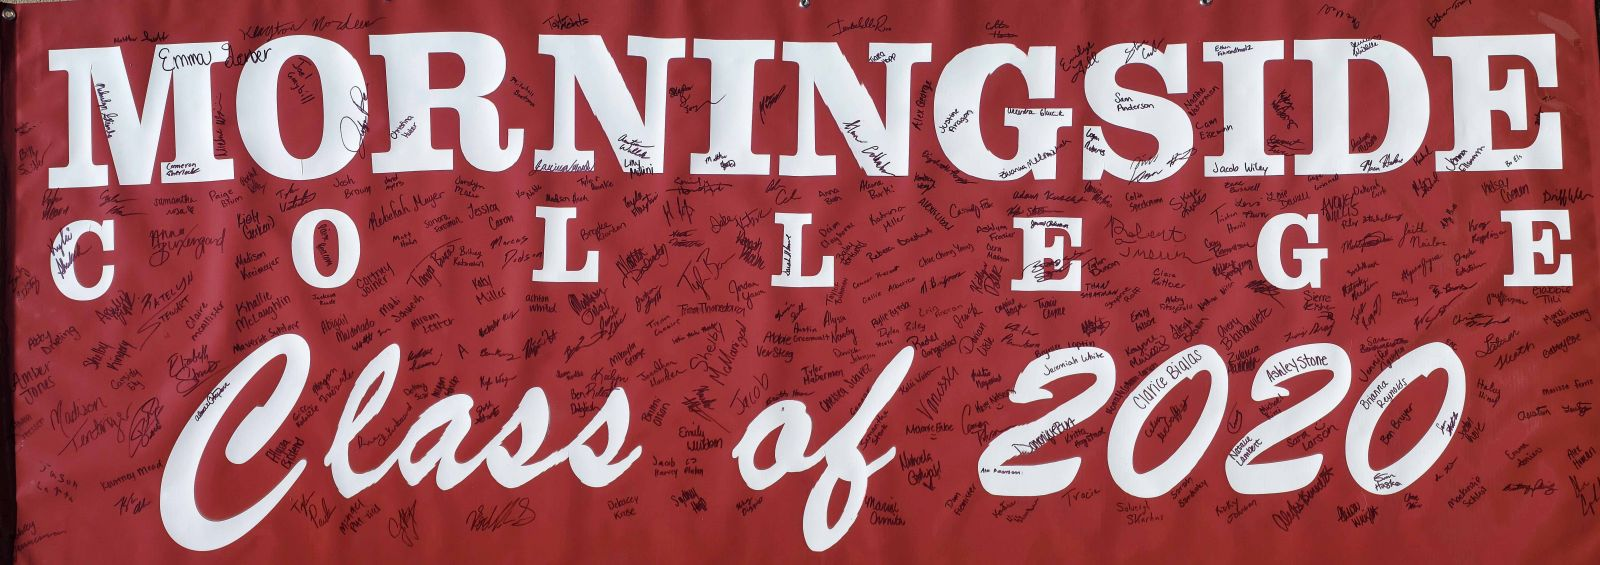 class of 2020 freshmen signatures banner photo